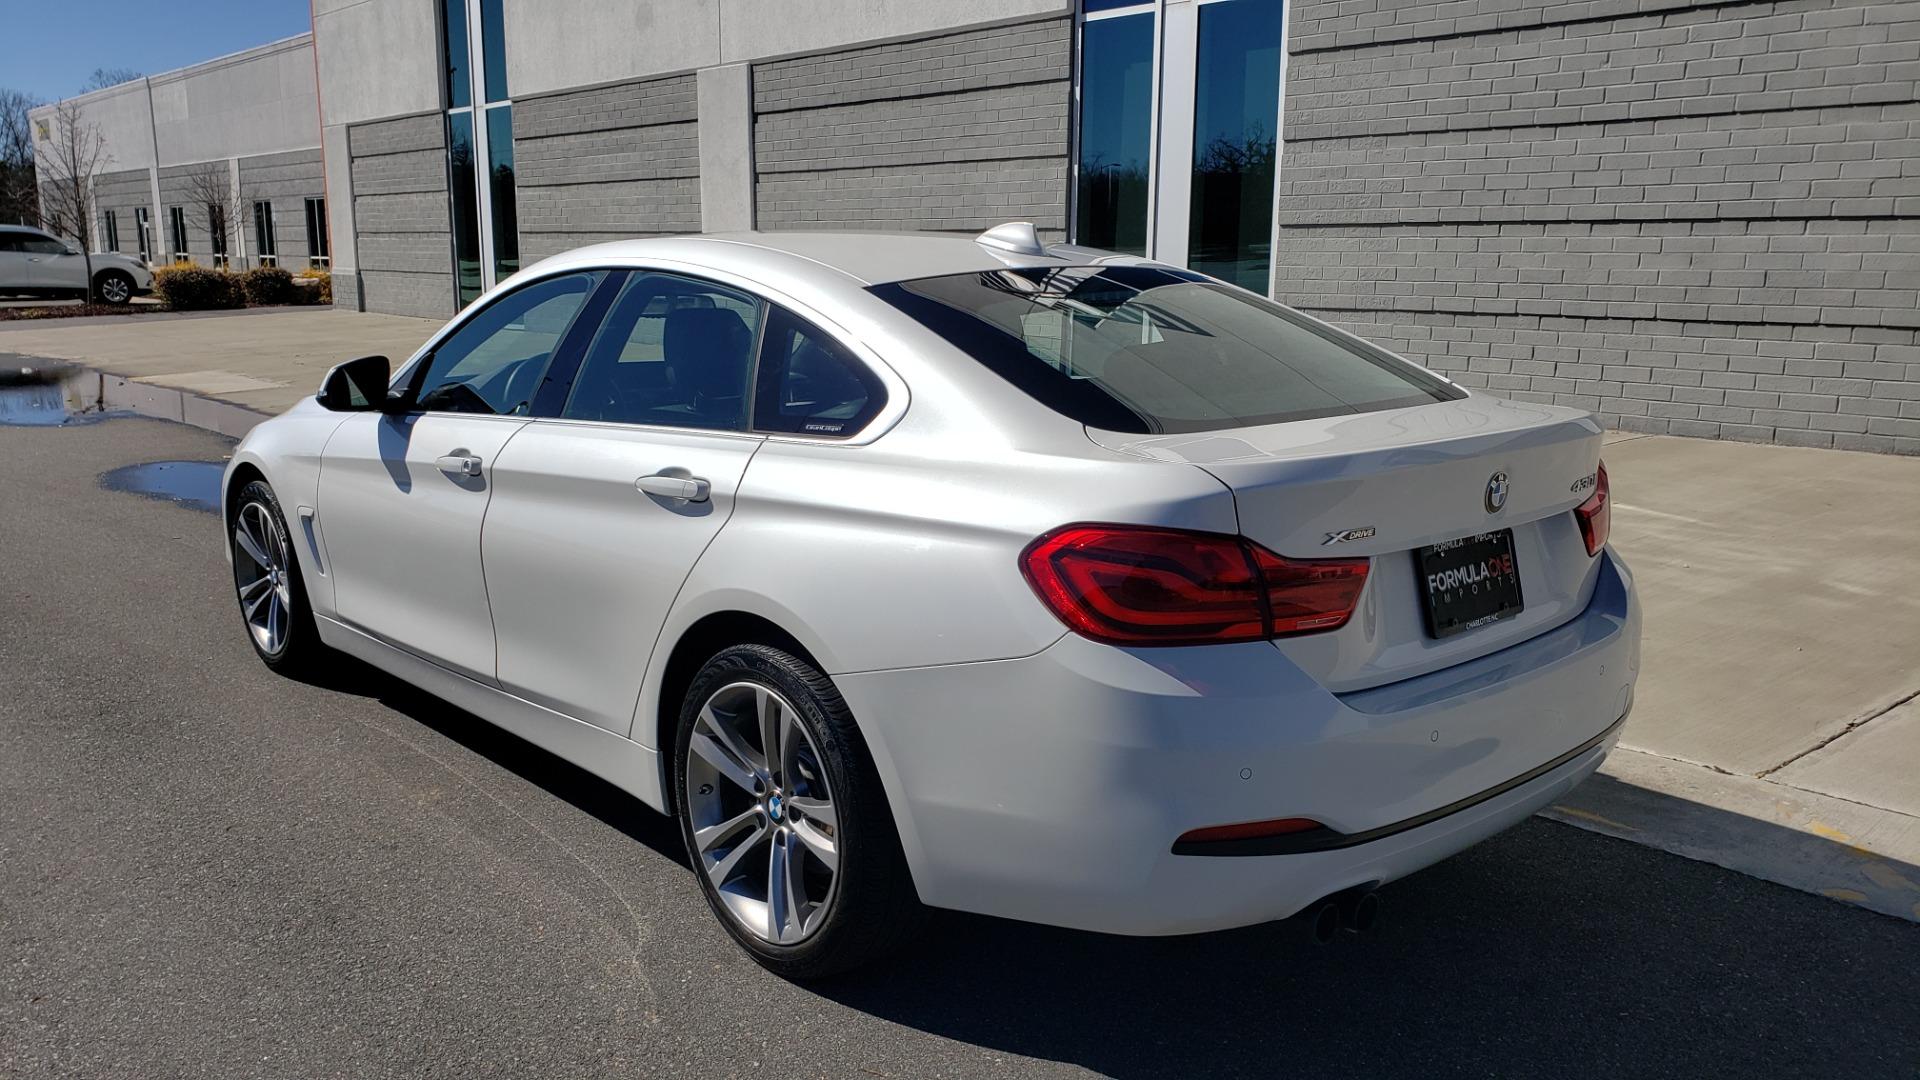 Used 2018 BMW 4 SERIES 430IXDRIVE / PREMIUM / NAV / SUNROOF / ESSENTIALS PKG for sale $28,995 at Formula Imports in Charlotte NC 28227 4